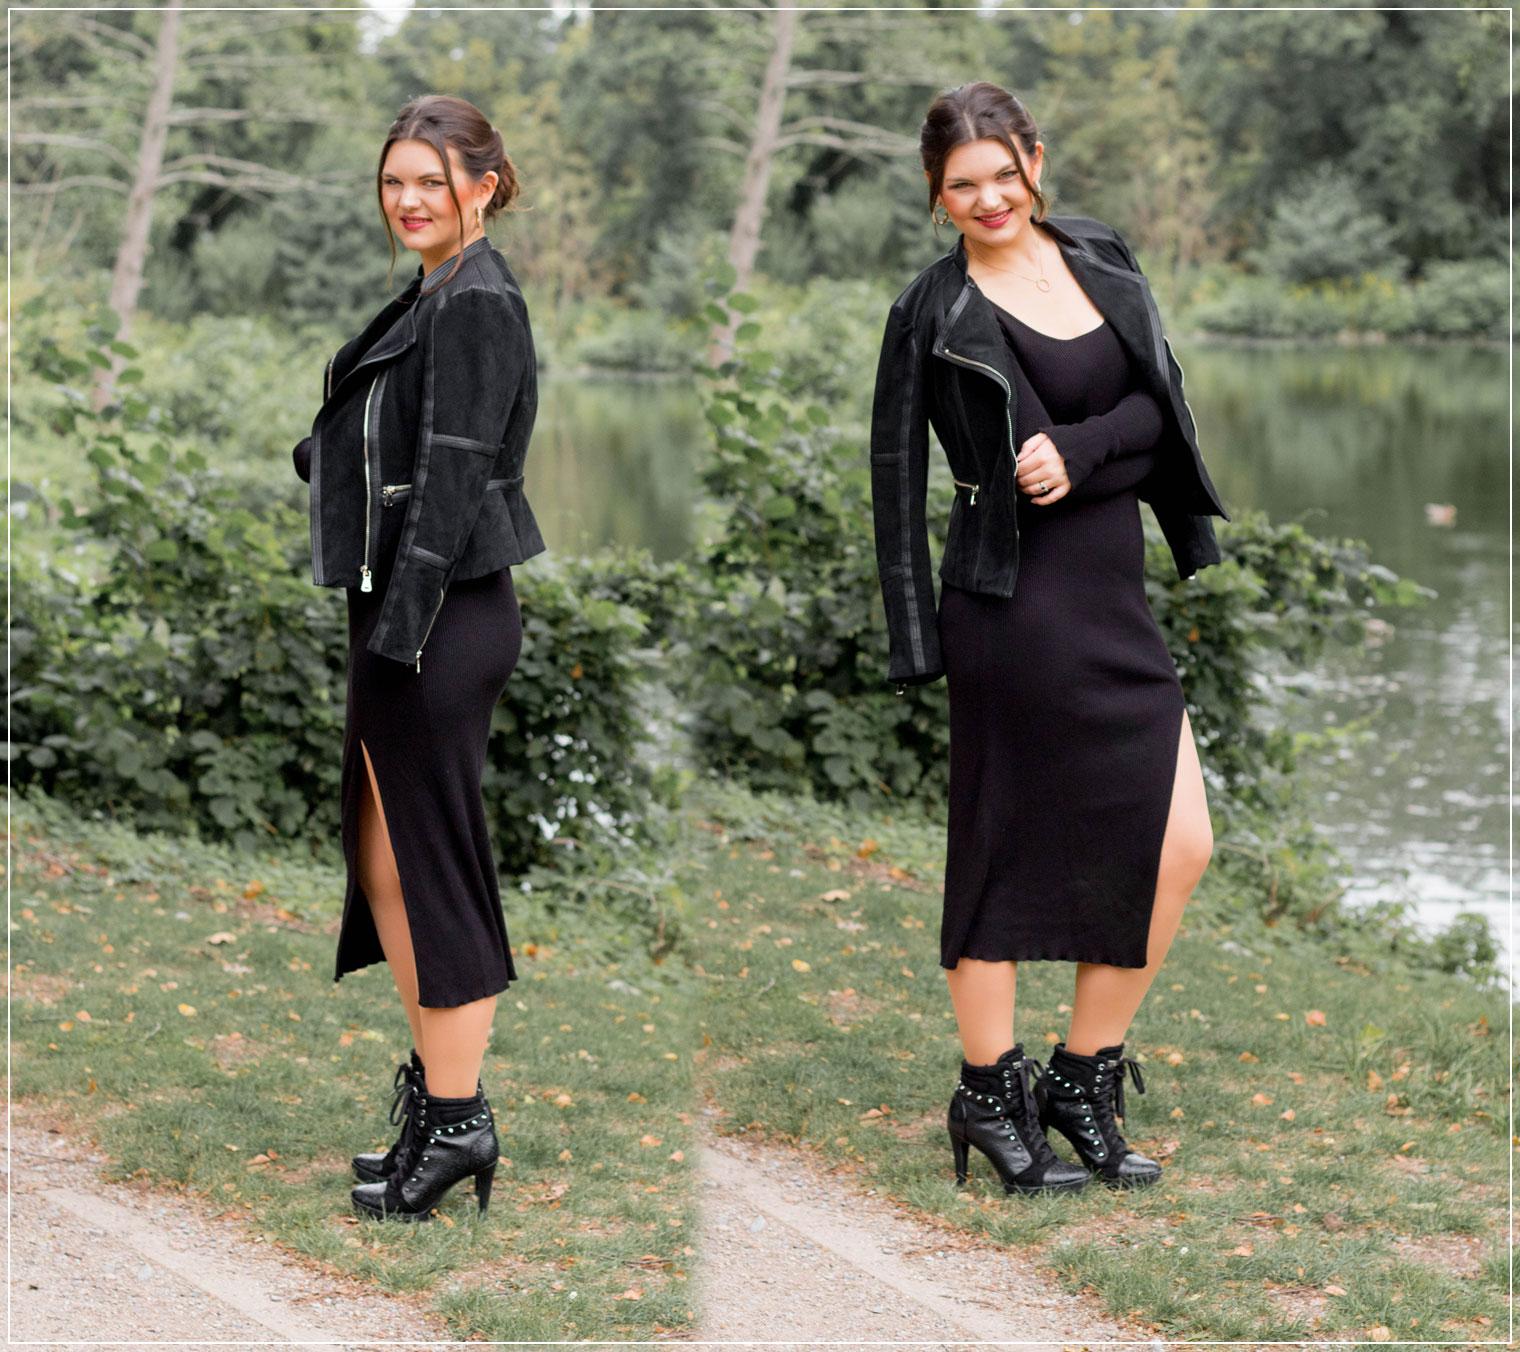 Rippenstrick, Herbstlook, Herbststyle, Herbstoutfit, Rockiger Herbstlook, Modetrend, Styleguide, Outfitinspiration, Modebloggerin, Fashionbloggerin, Modeblog, Ruhrgebiet